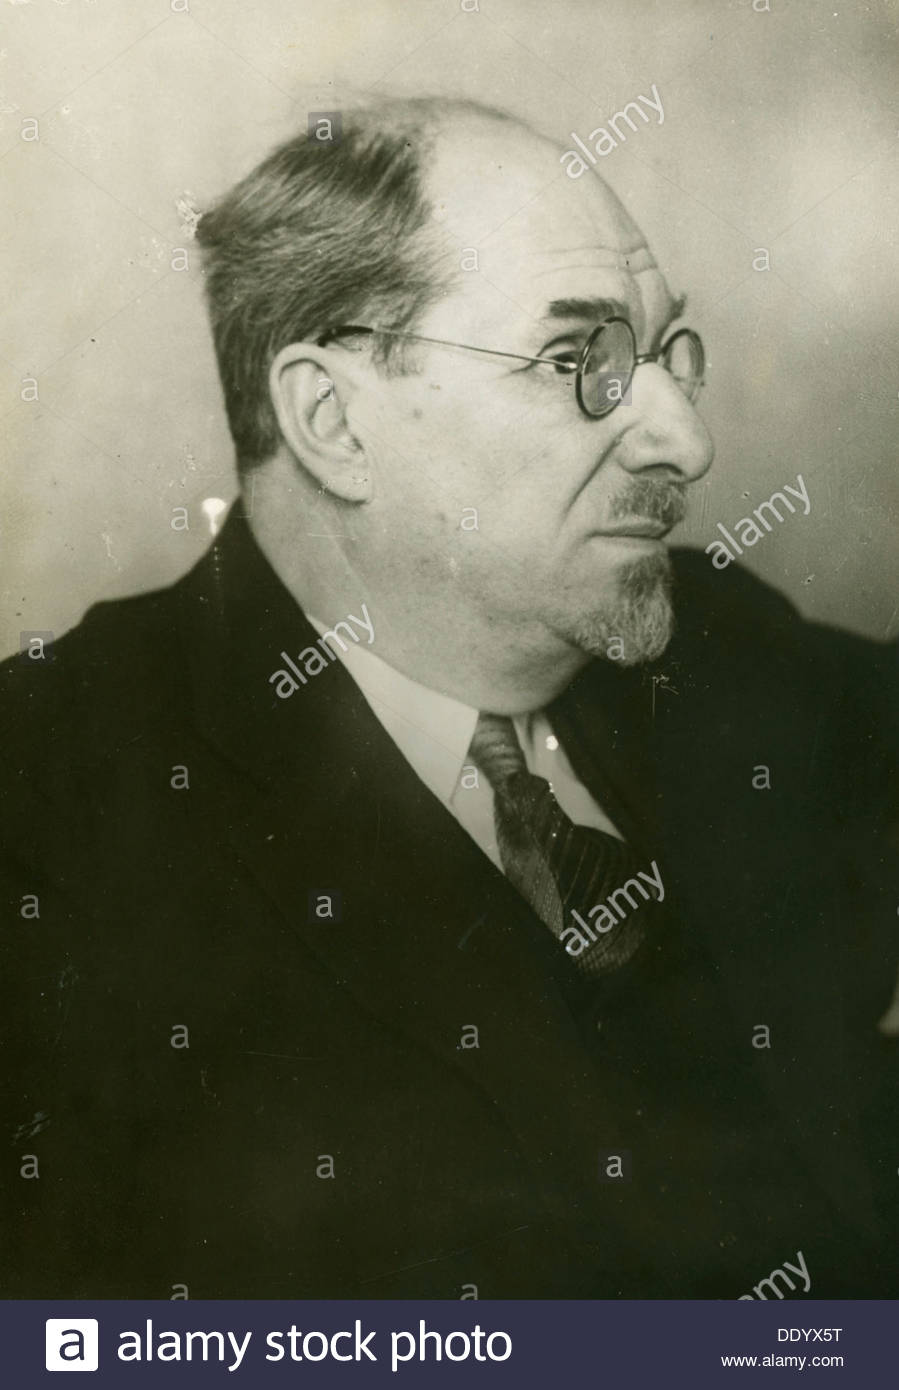 Anatoly Lunacharsky, Soviet politician, early 1930s. - Stock Image